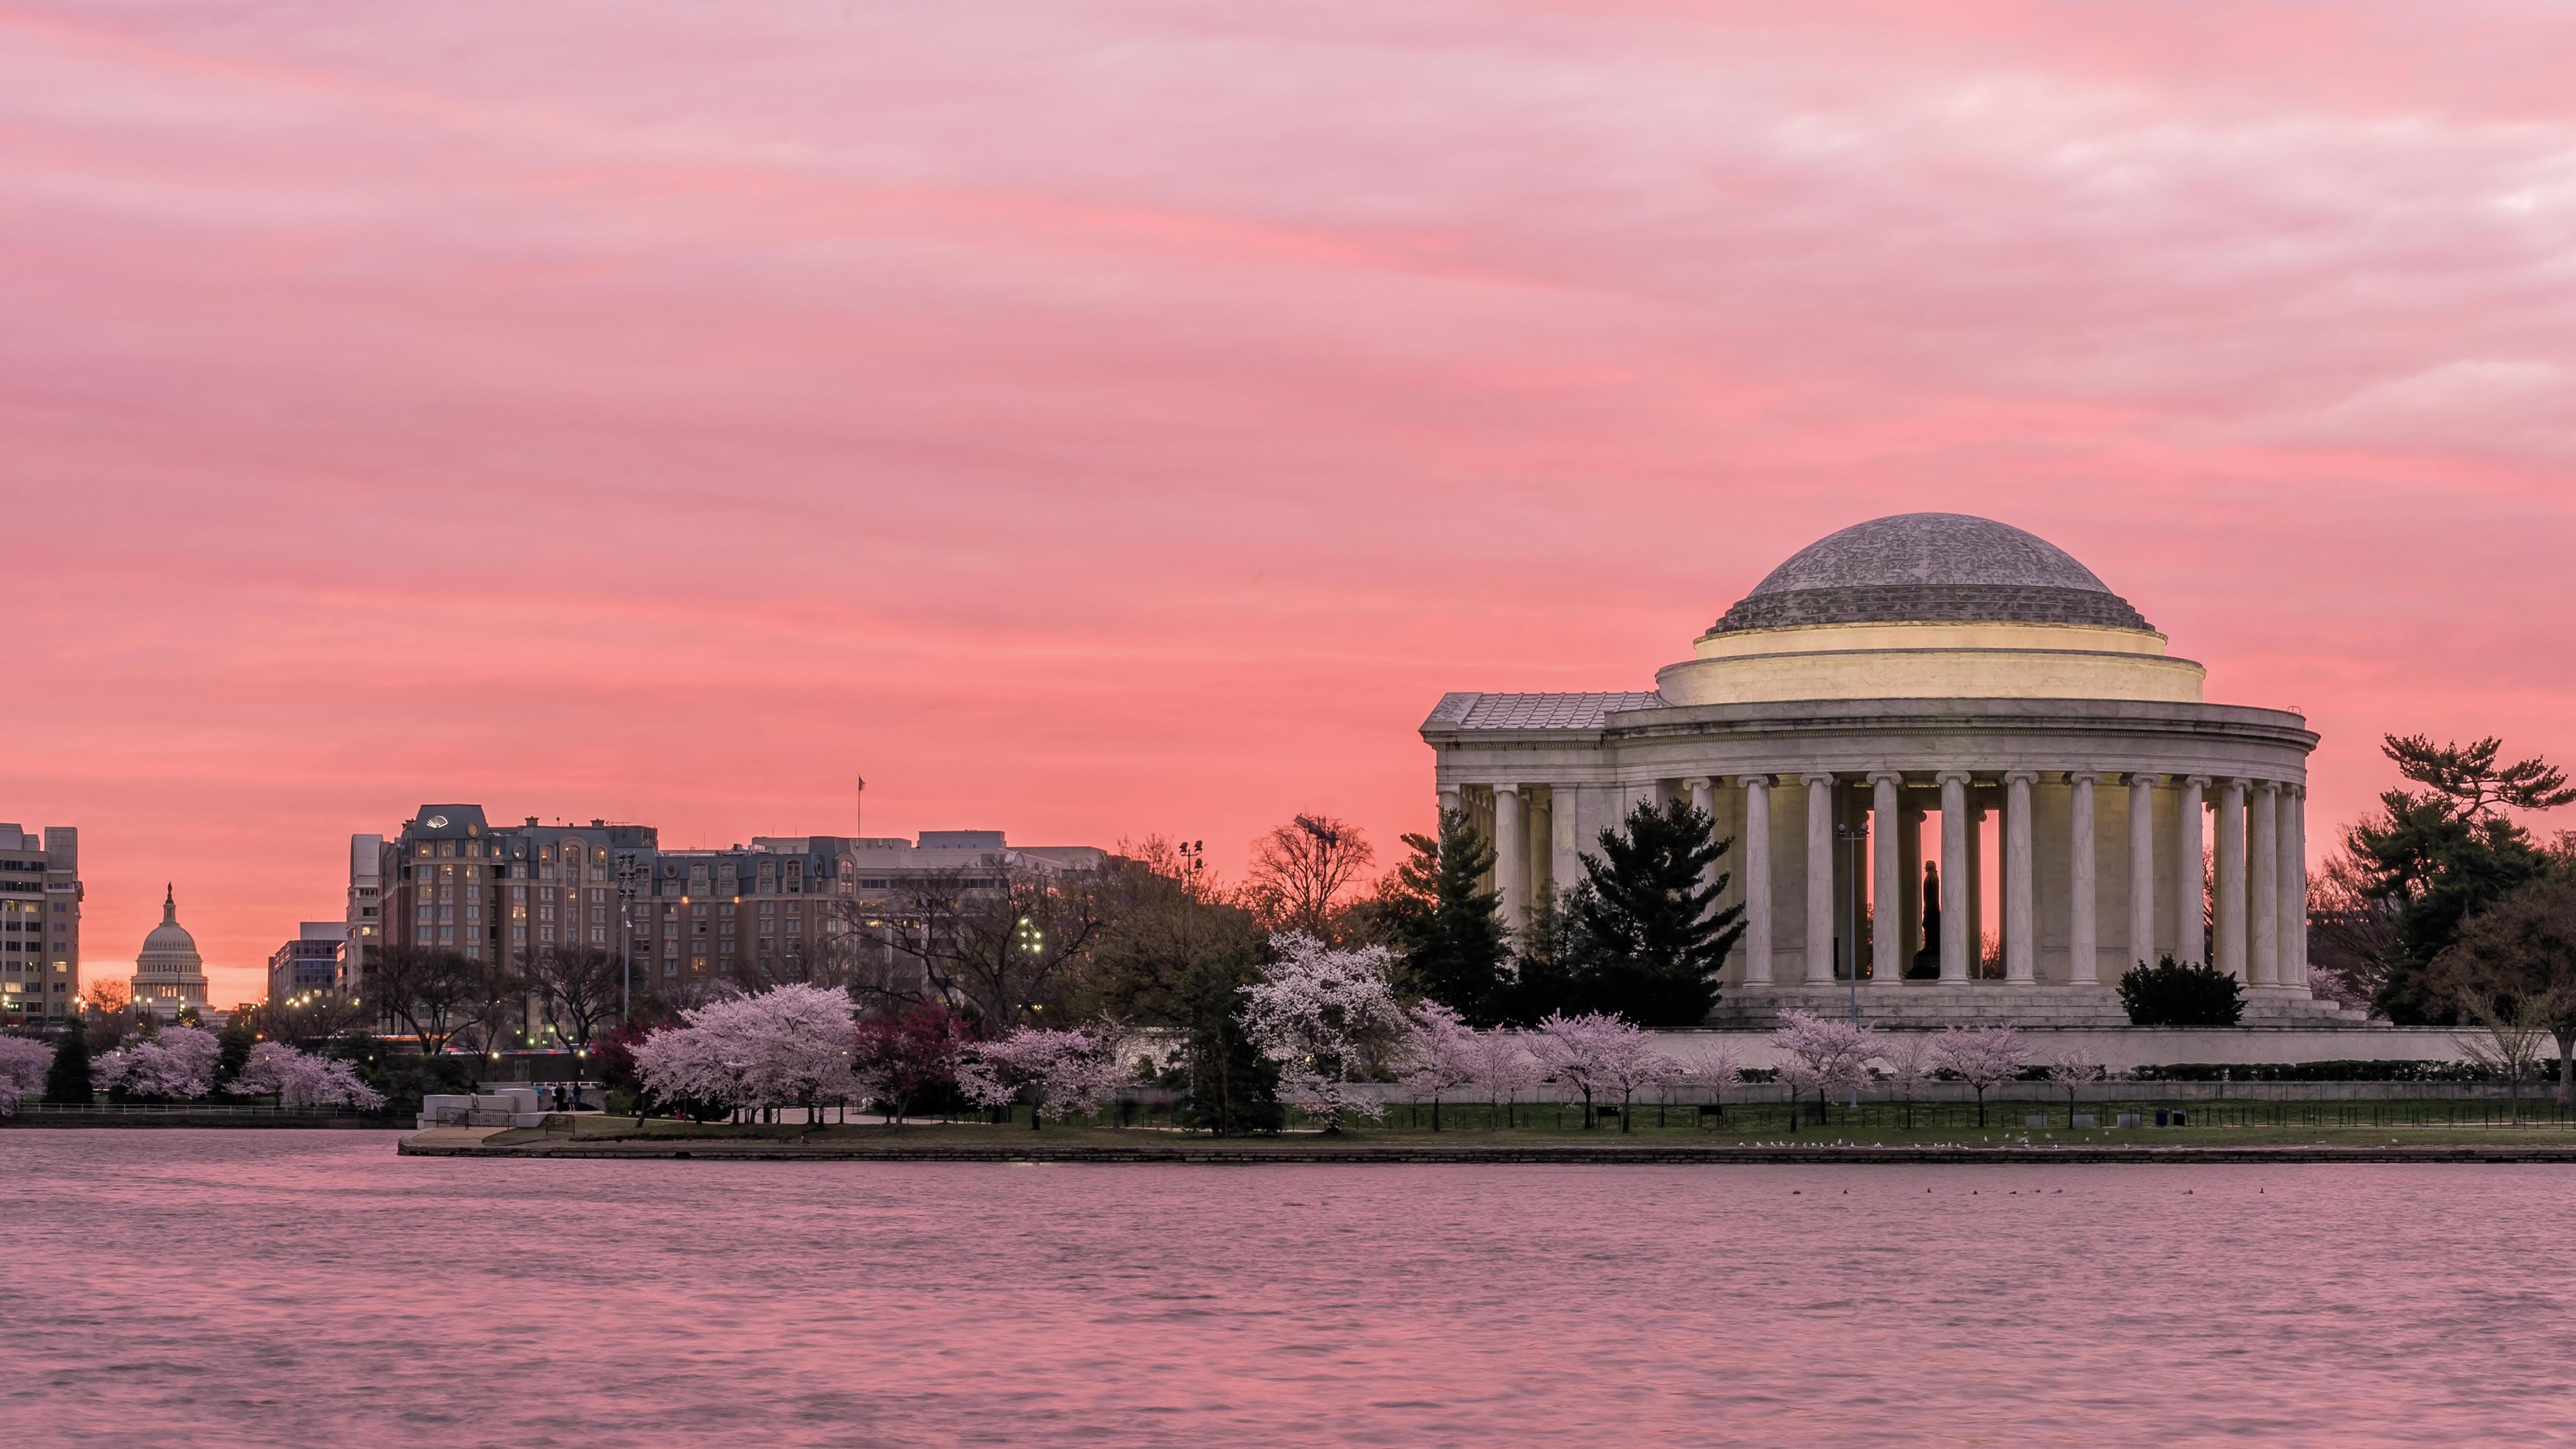 John Thomas, Cherry Blossom Sunrise